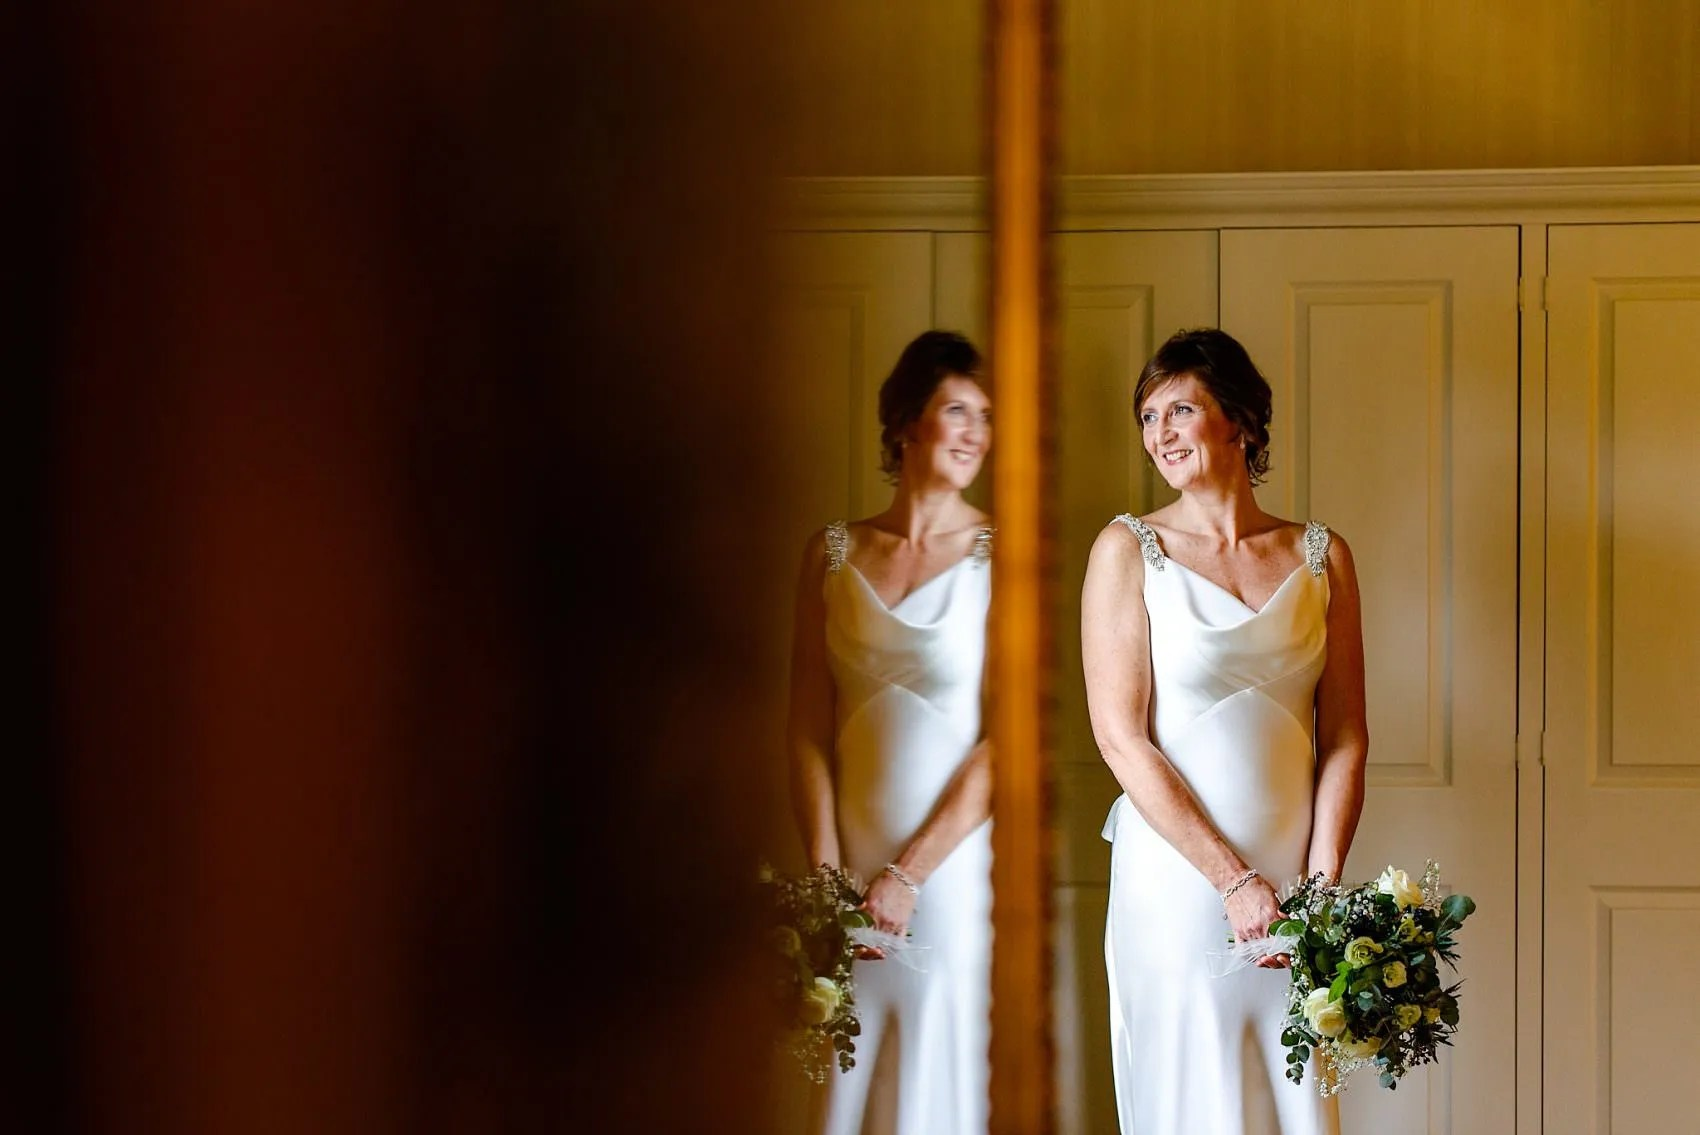 Larmer-Tree-wedding0021